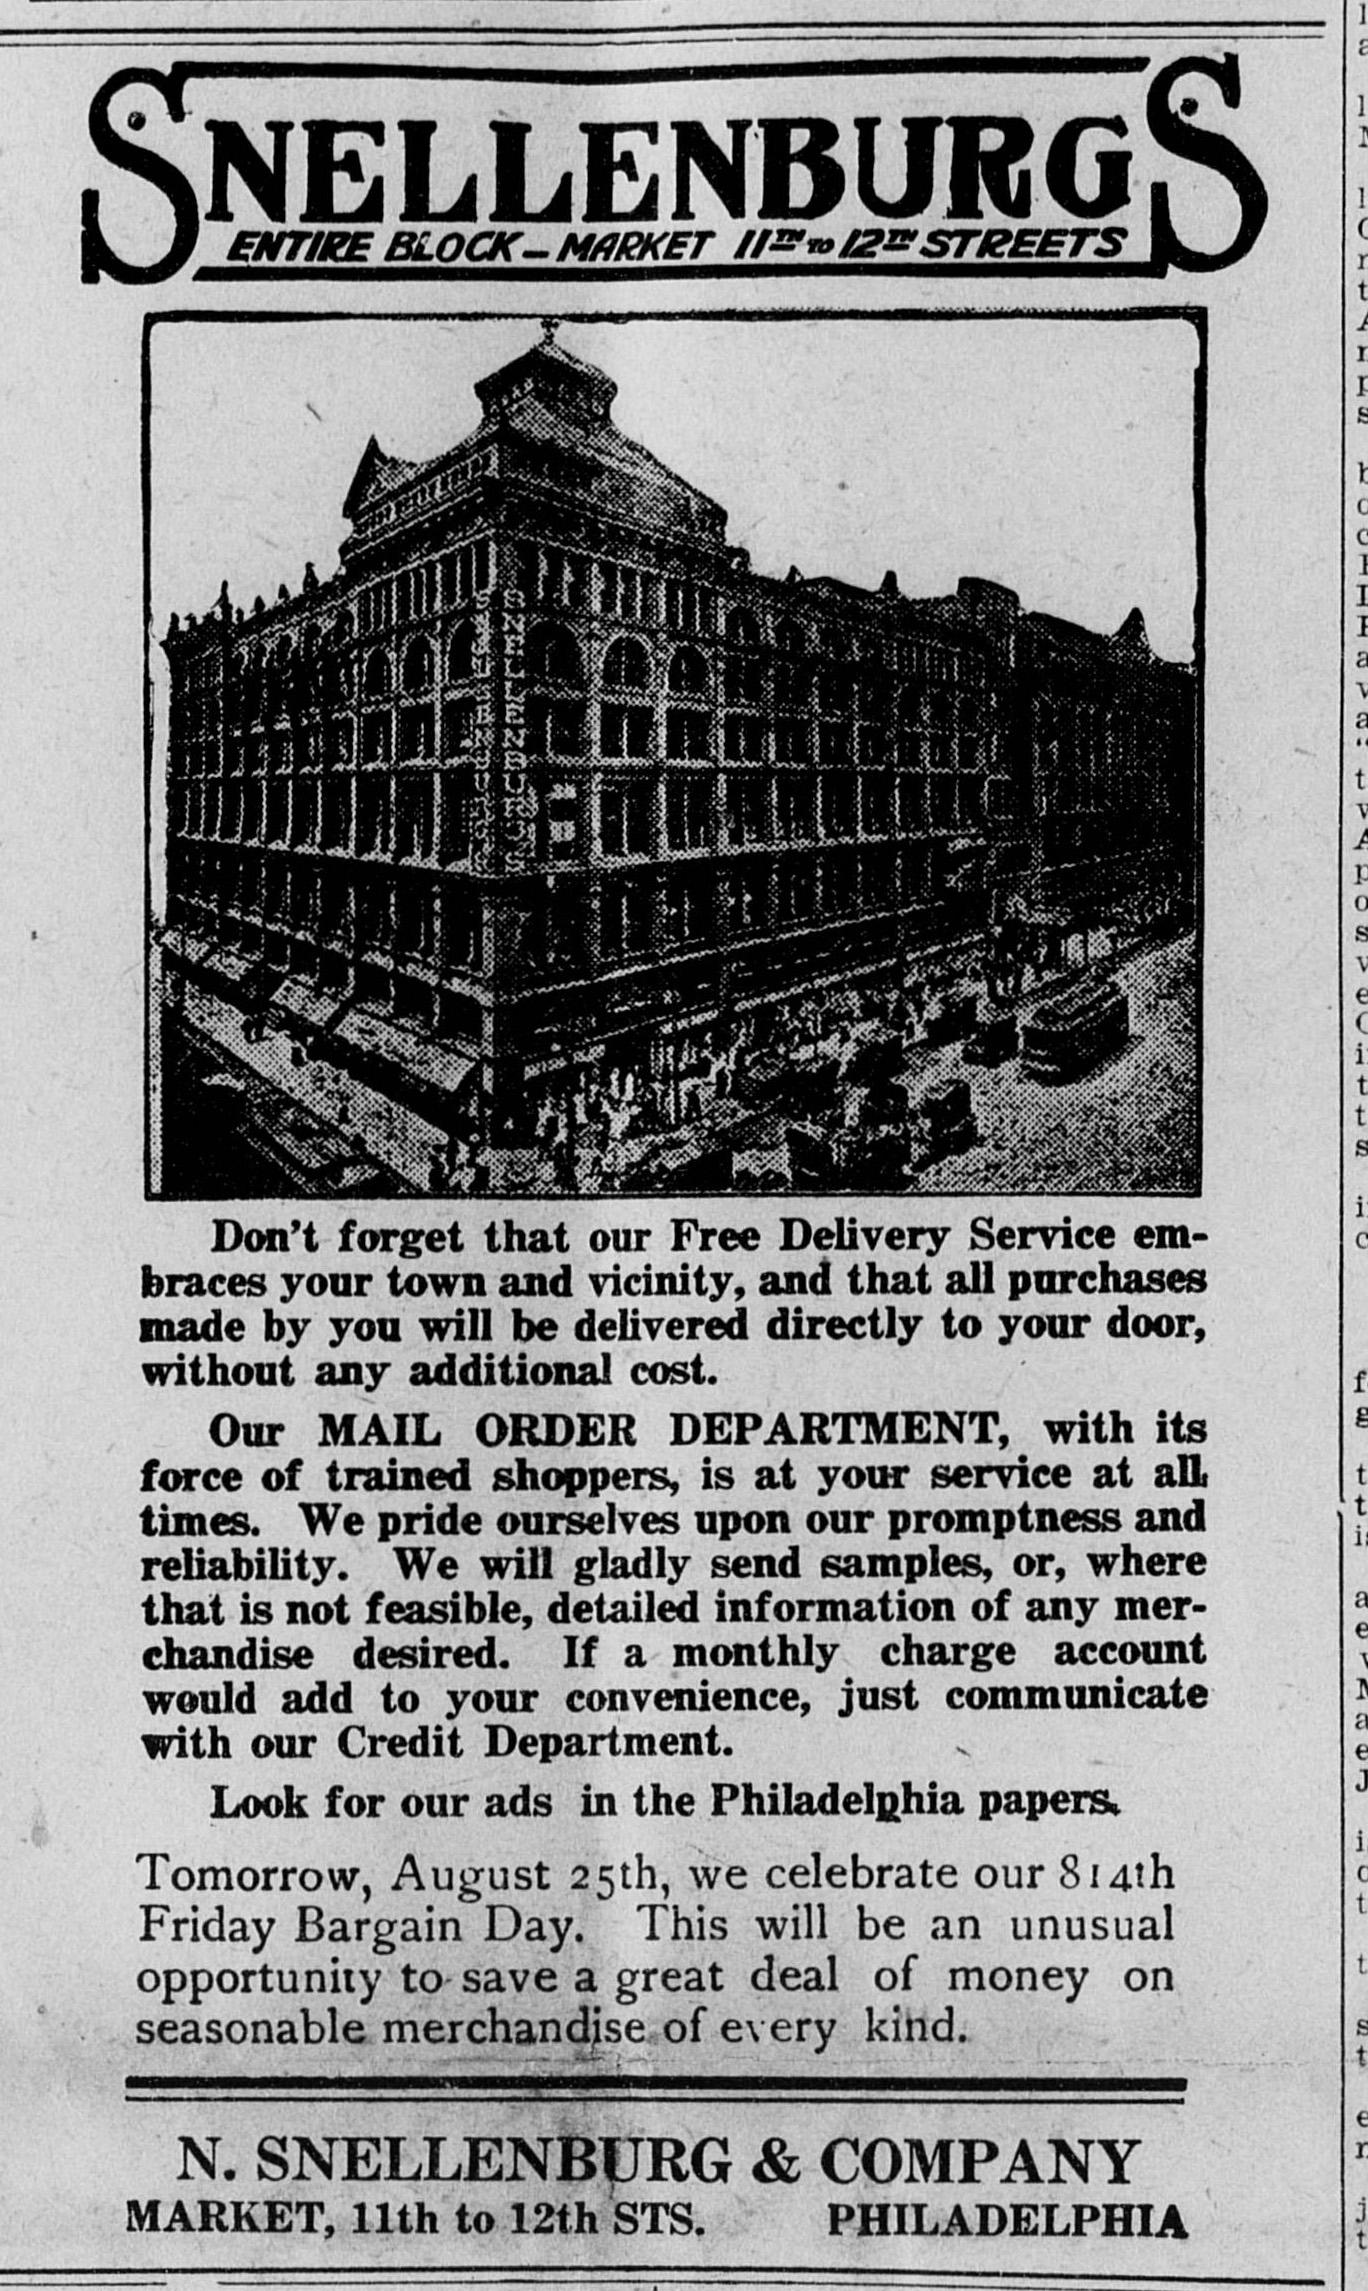 Snellenberg Department store advertisement, 1916